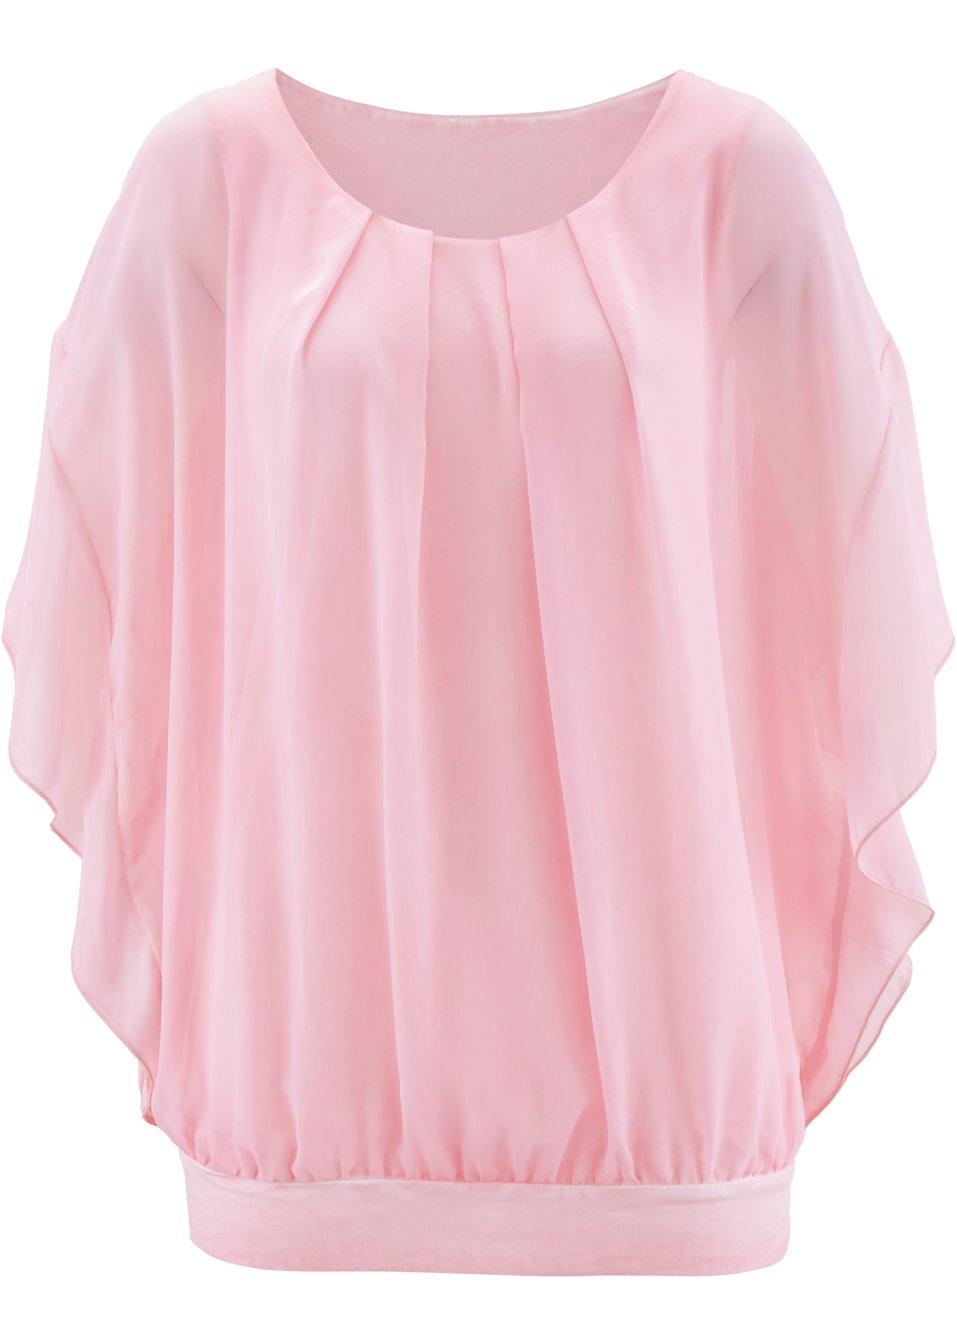 blouse rose poudr femme bpc selection premium. Black Bedroom Furniture Sets. Home Design Ideas